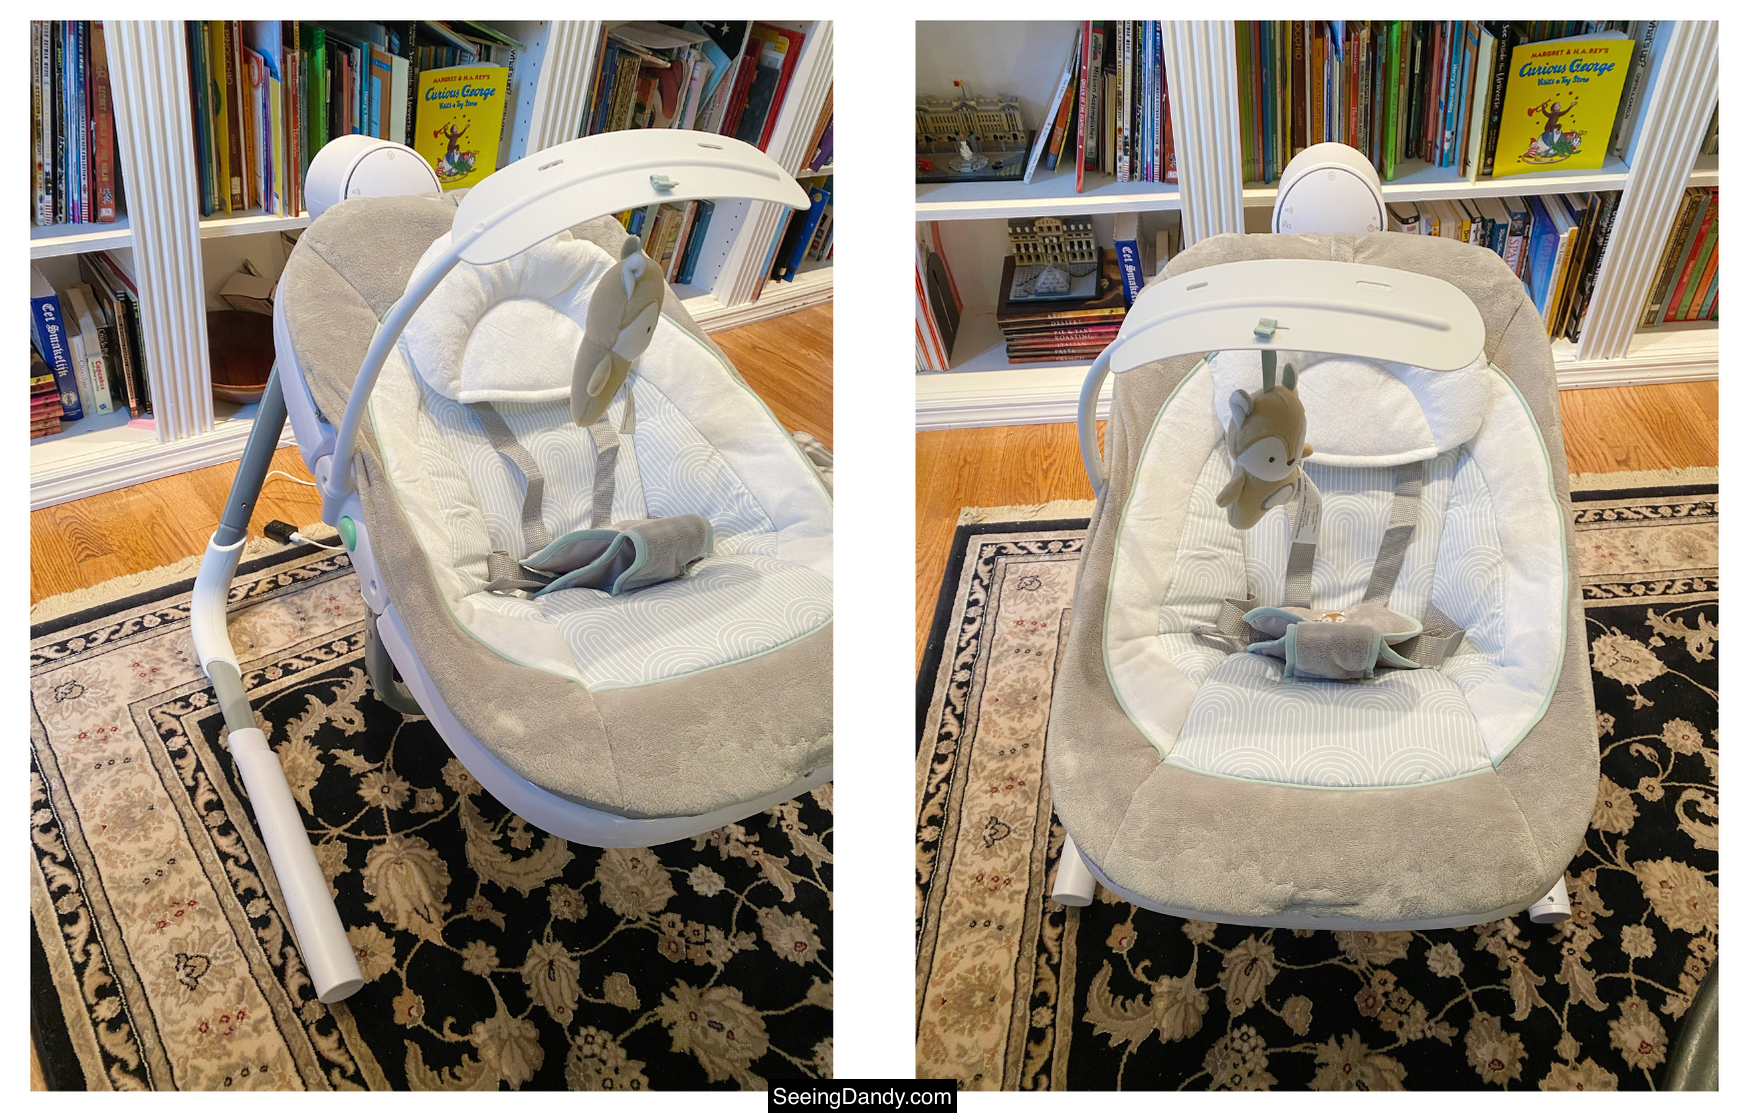 ingenuity baby swing, electric baby swing, infant gear, baby shower gift ideas, anyway sway swing, fox toy, usb swing